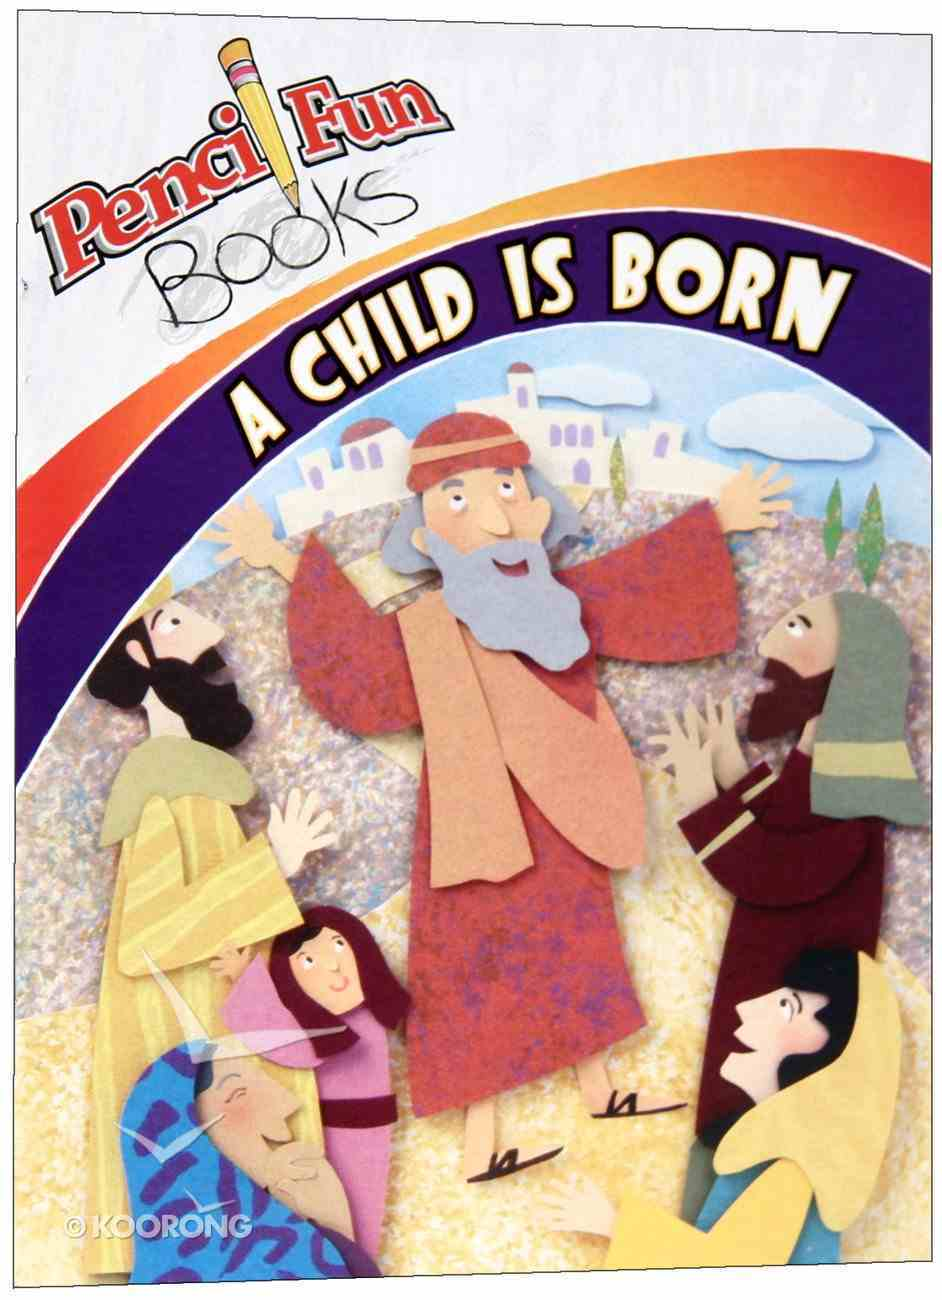 A Child is Born (Pencil Fun Books Series) Paperback